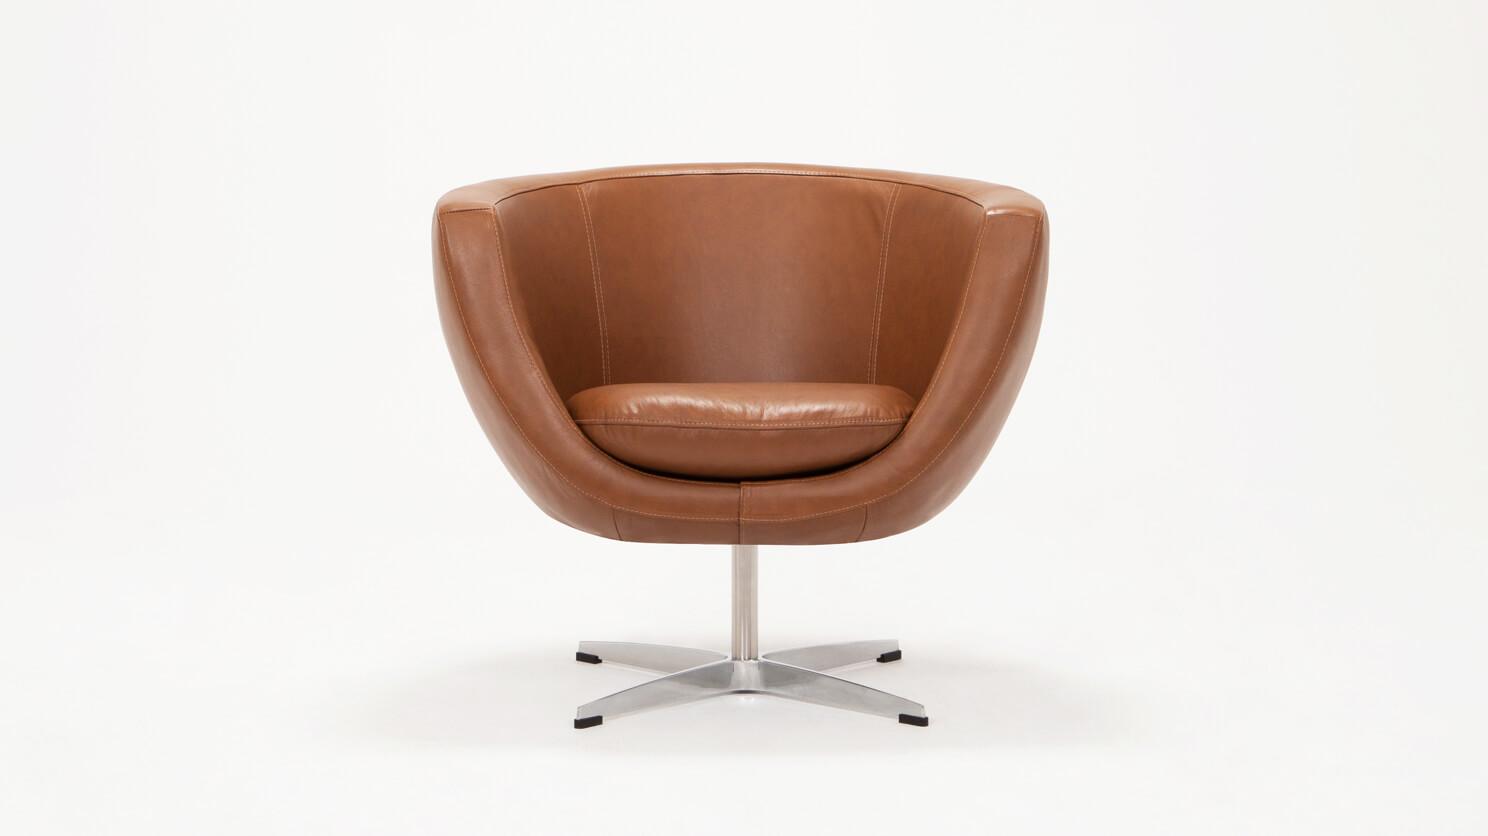 Prime Tub Chair Leather Eq3 Creativecarmelina Interior Chair Design Creativecarmelinacom